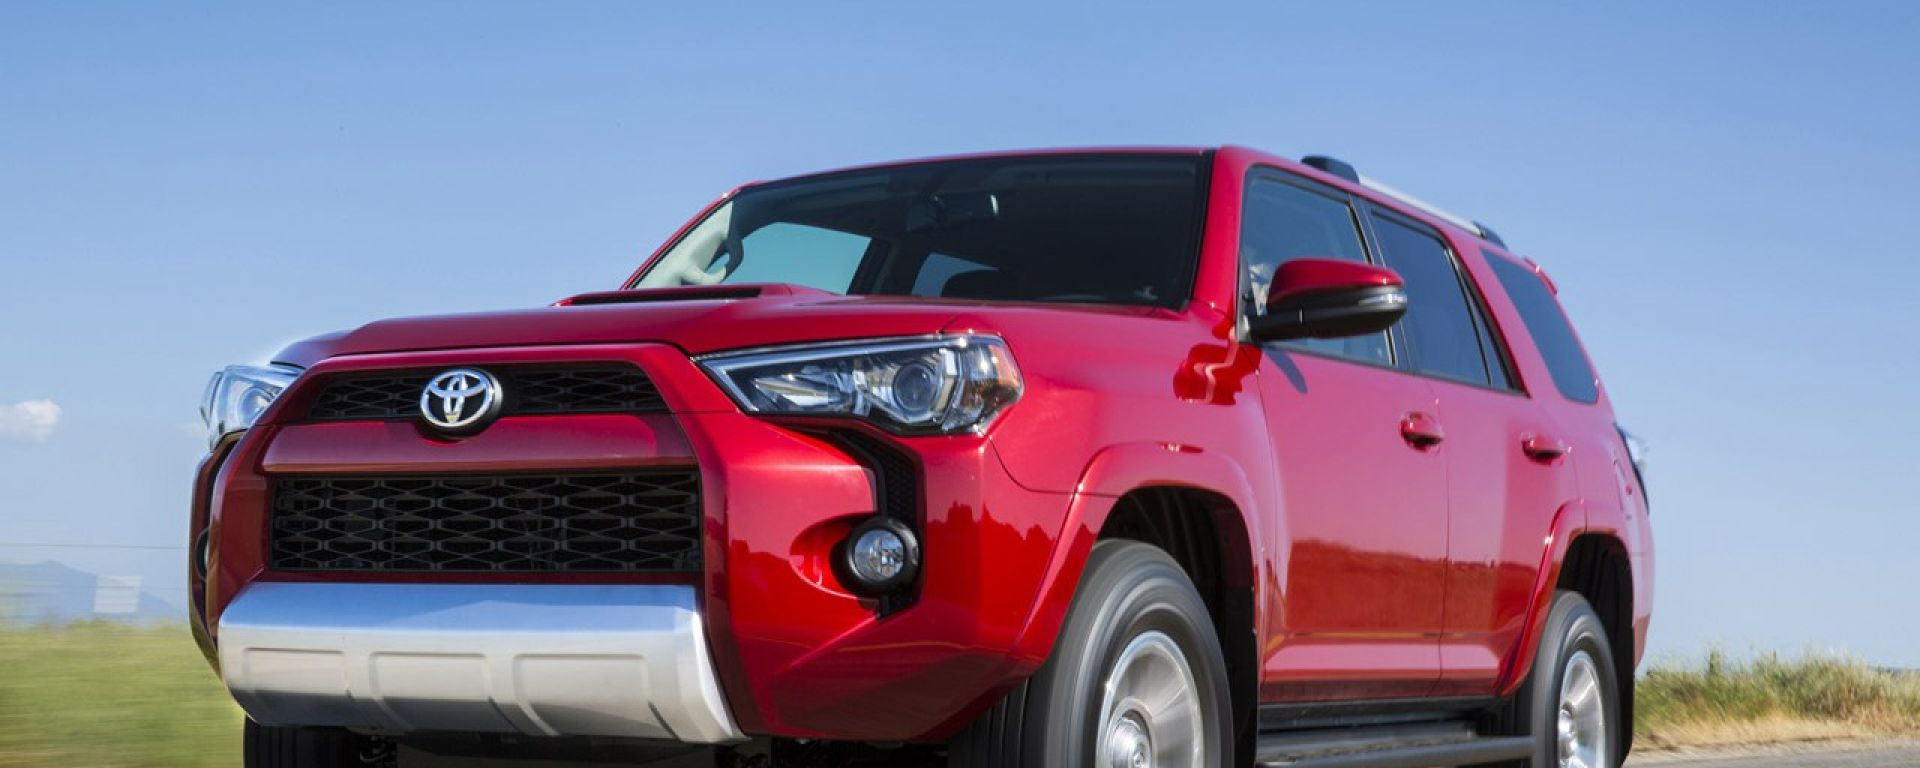 Toyota 4Runner 2014, il video ufficiale